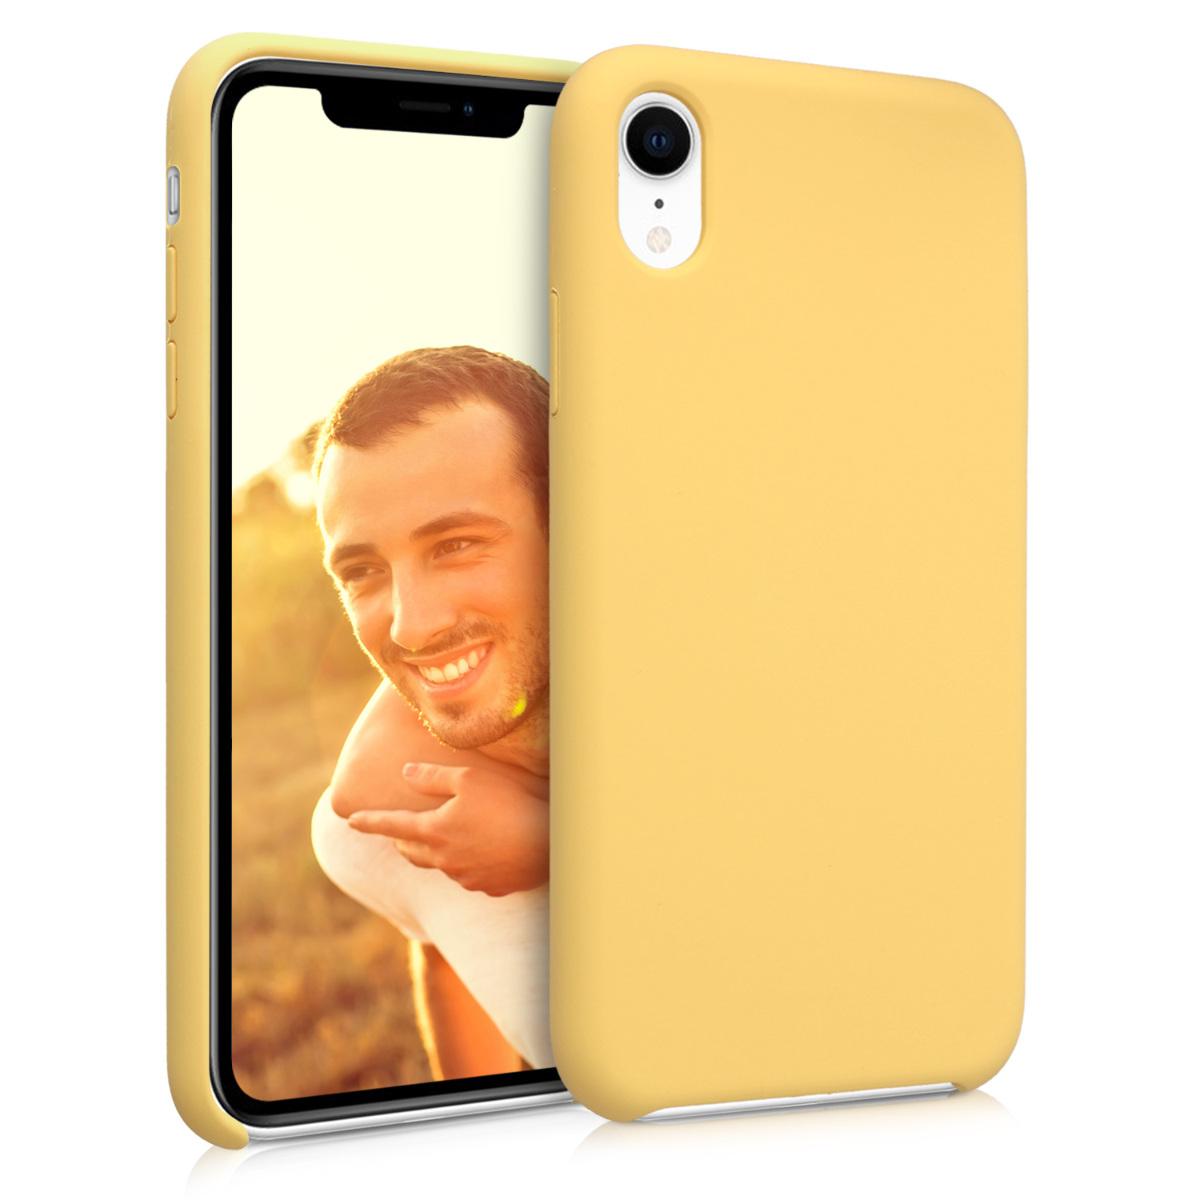 KW Θήκη Σιλικόνης TPU Apple iPhone XR - Soft Flexible Rubber  - Yellow (45910.49)